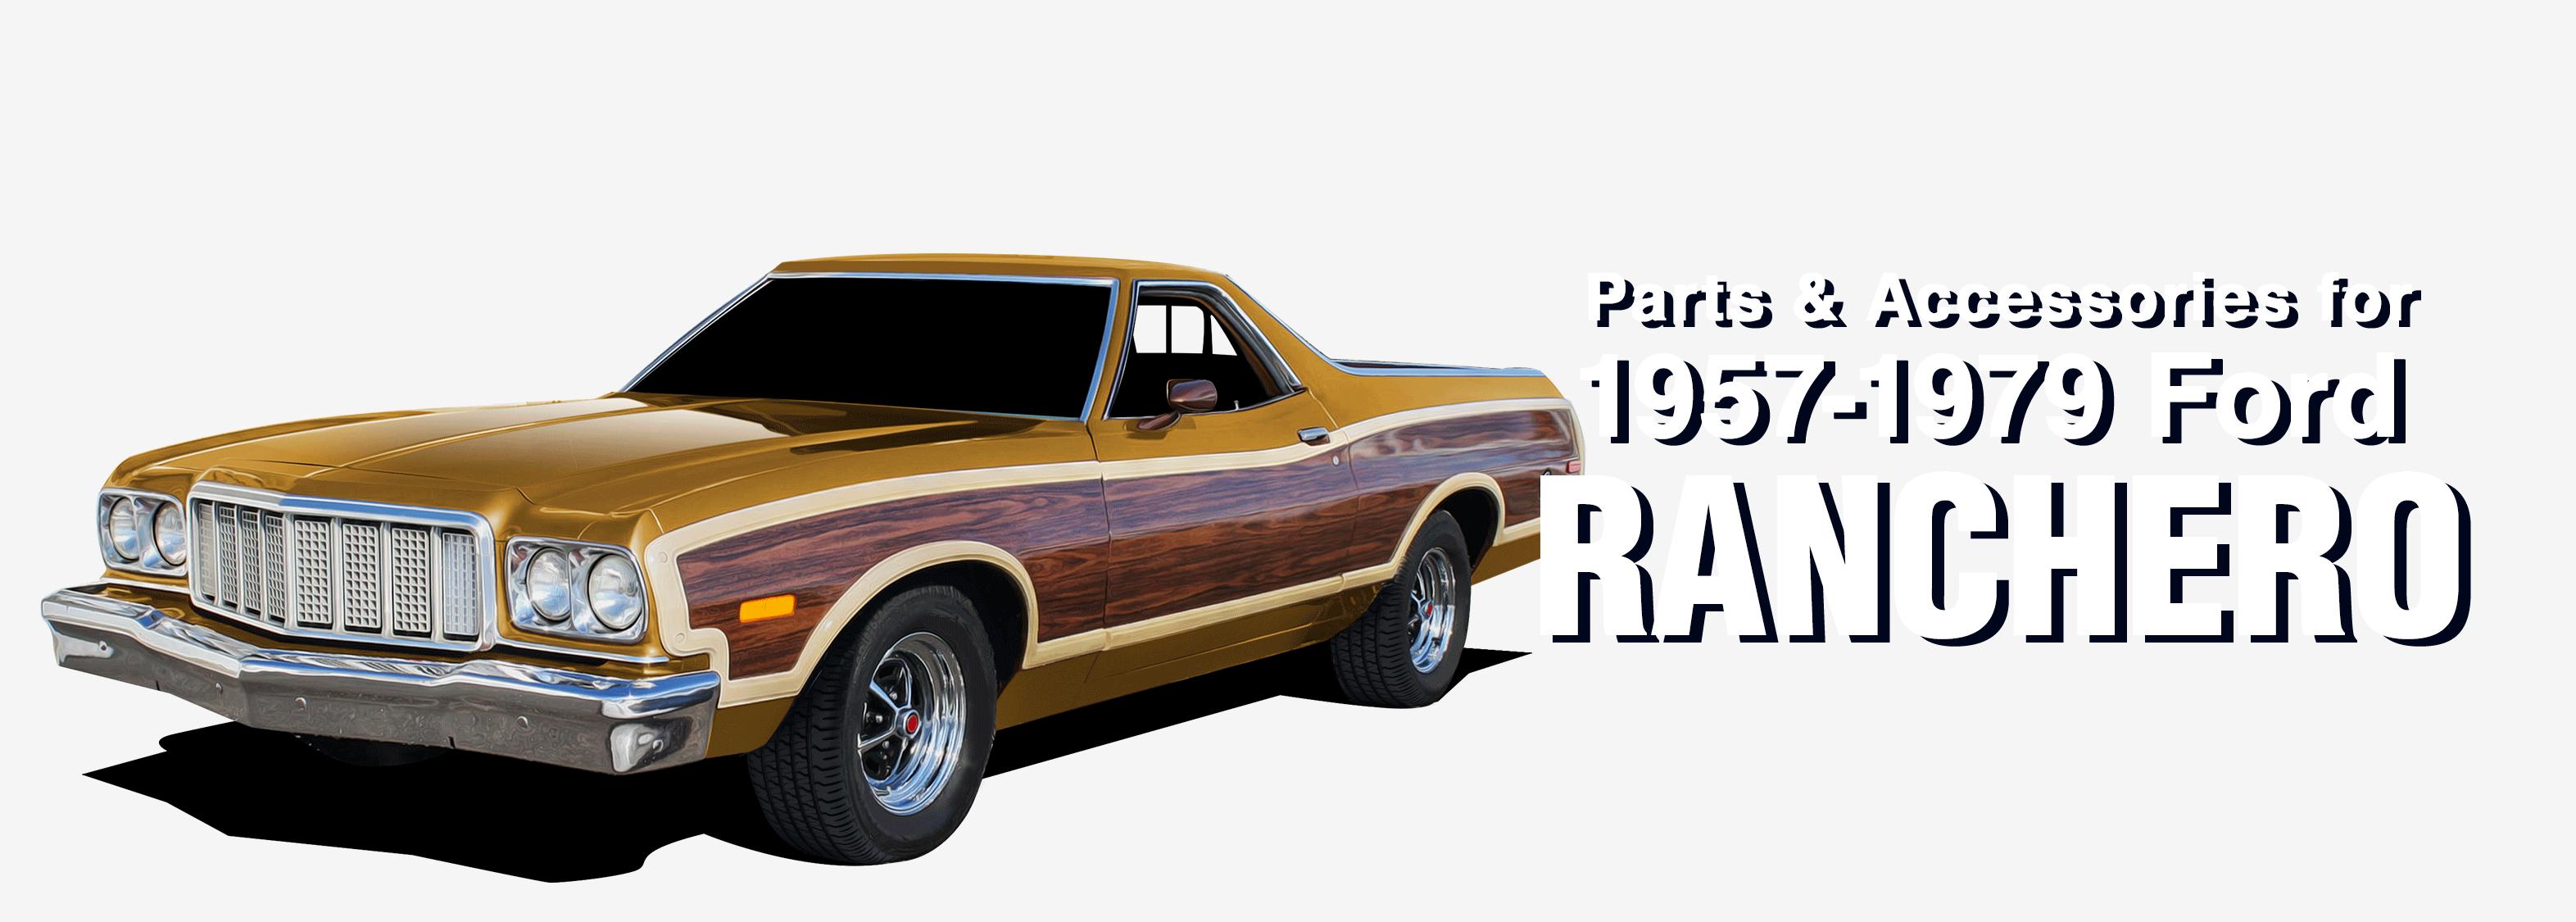 Ford-Ranchero-vehicle-desktop_v2